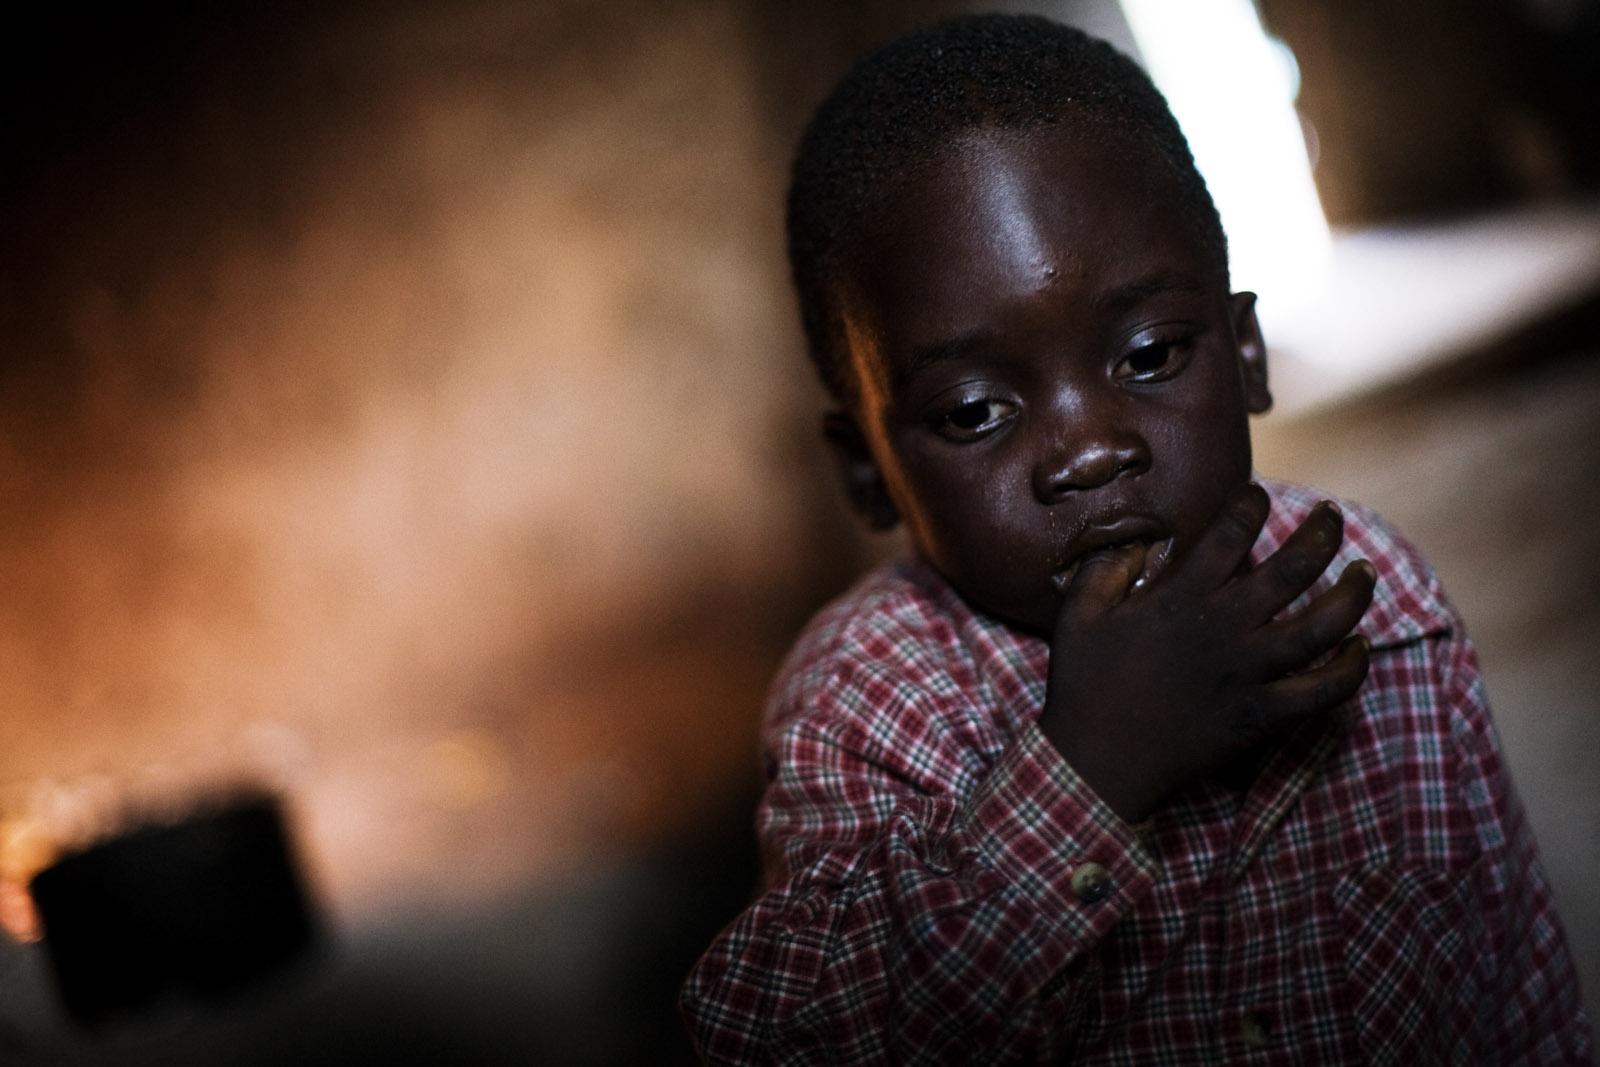 liberia-refugies-ivoiriens-0311-0274hd